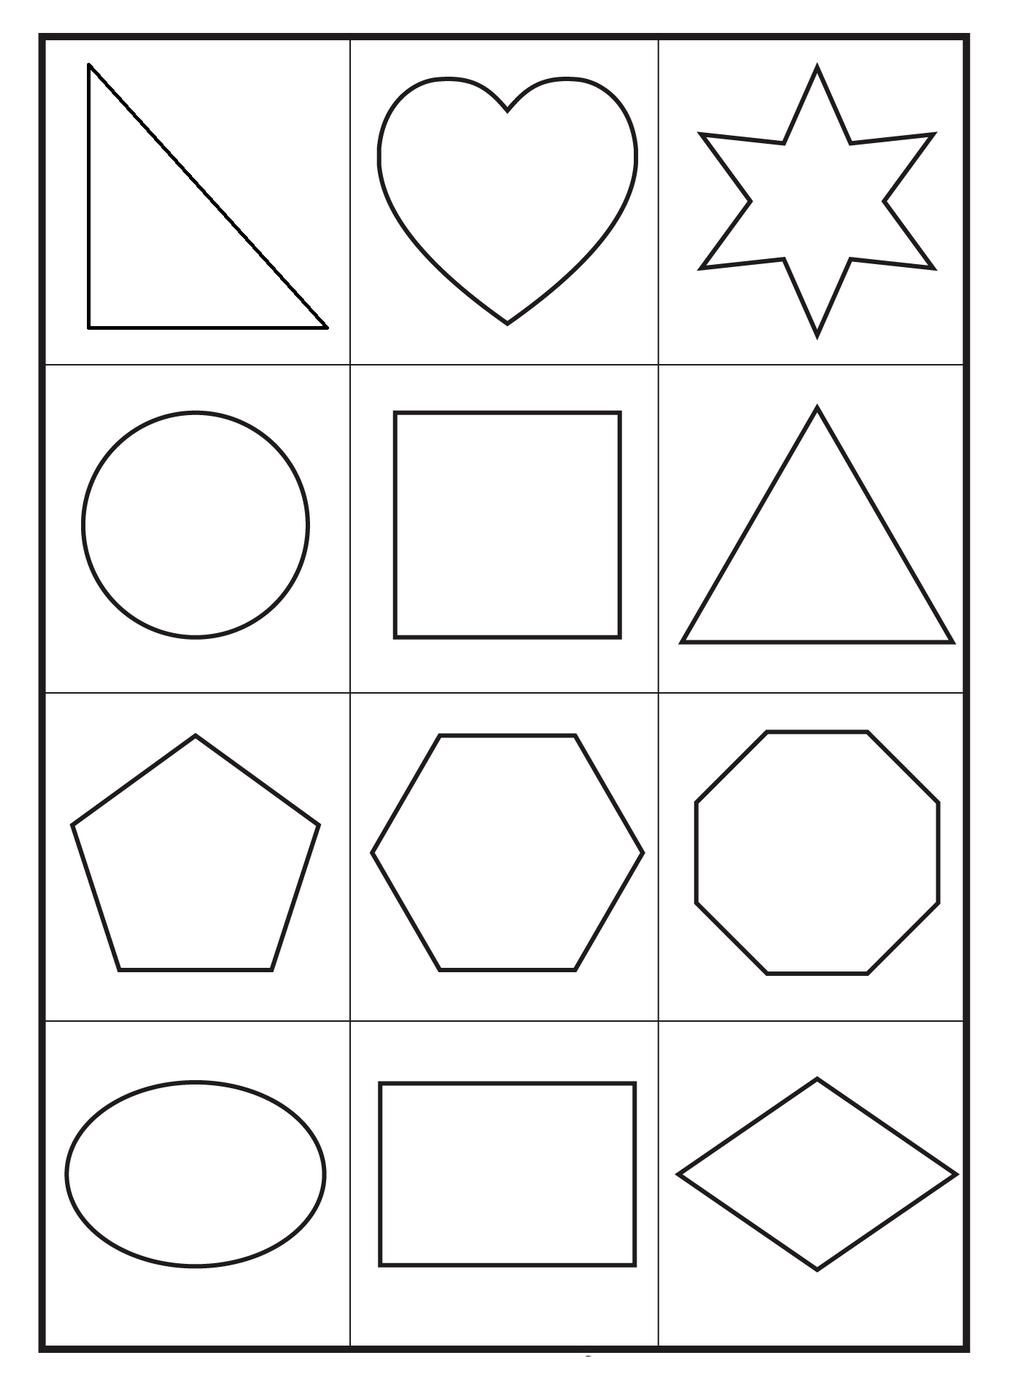 Basic Printable Shapes Coloring Sheet